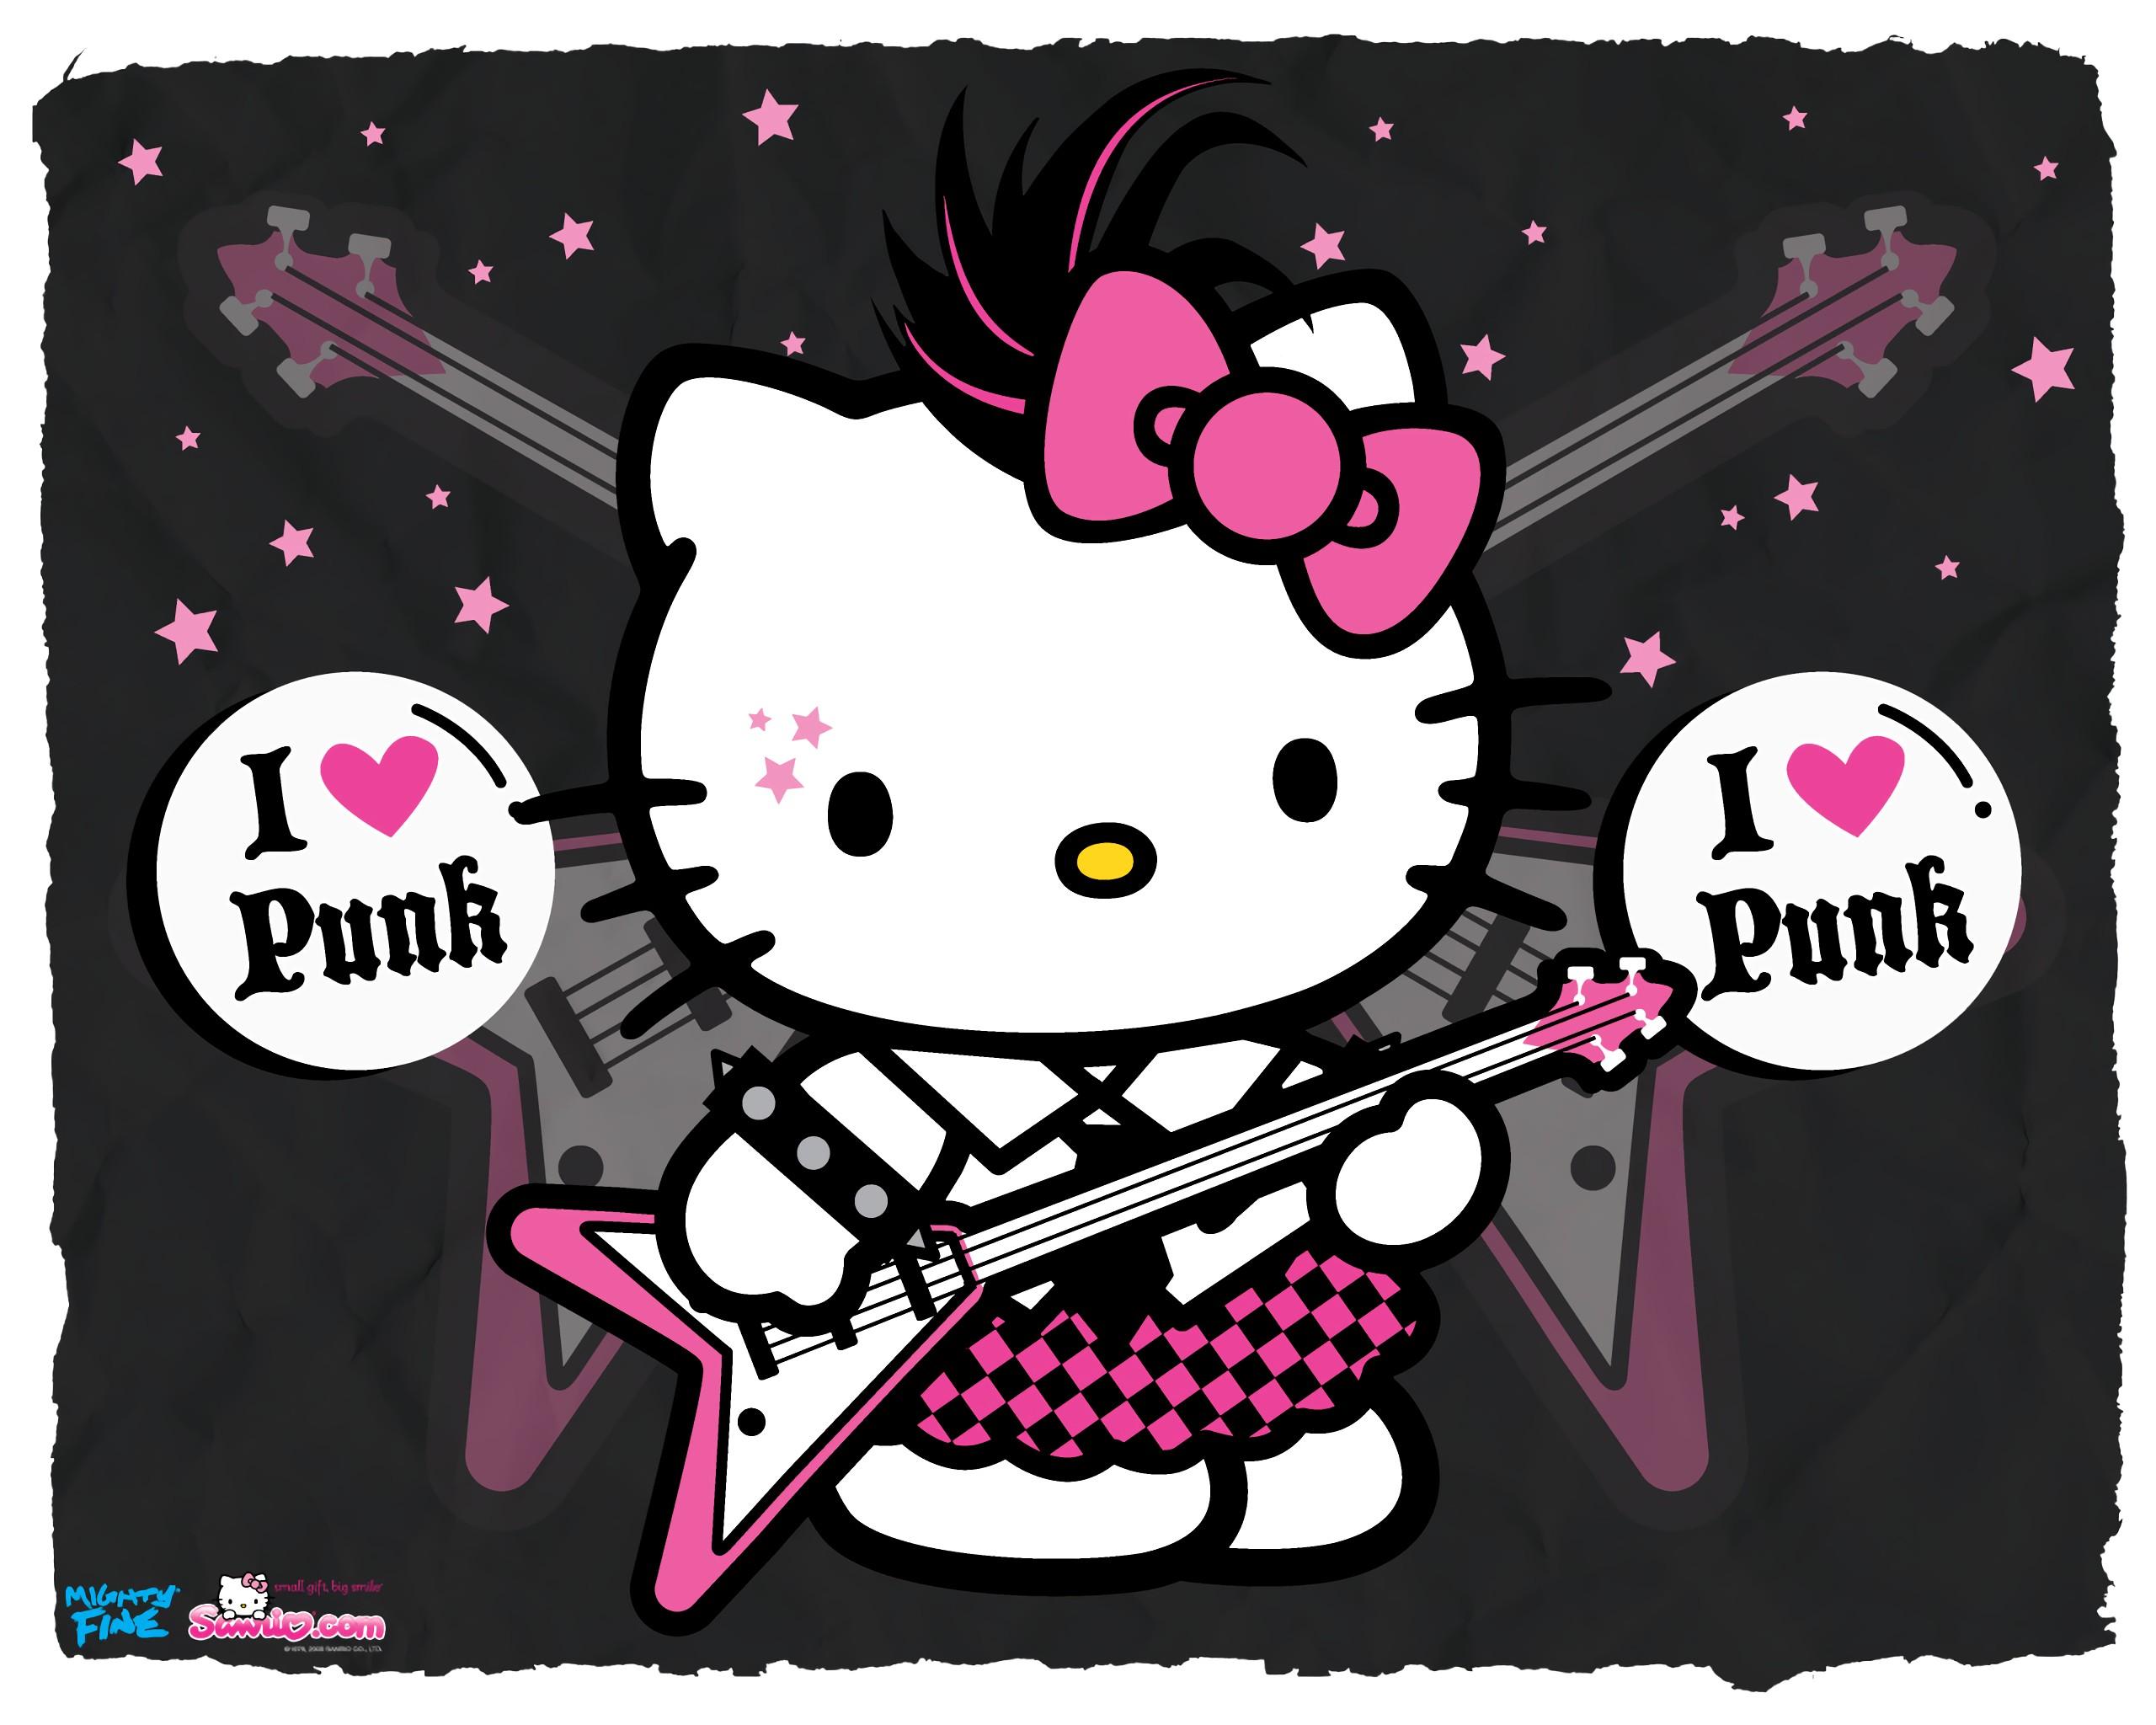 Fantastic Wallpaper Hello Kitty Cell Phone - 319496-popular-hello-kitty-wallpaper-2560x2048-cell-phone  Pic_169224.jpg